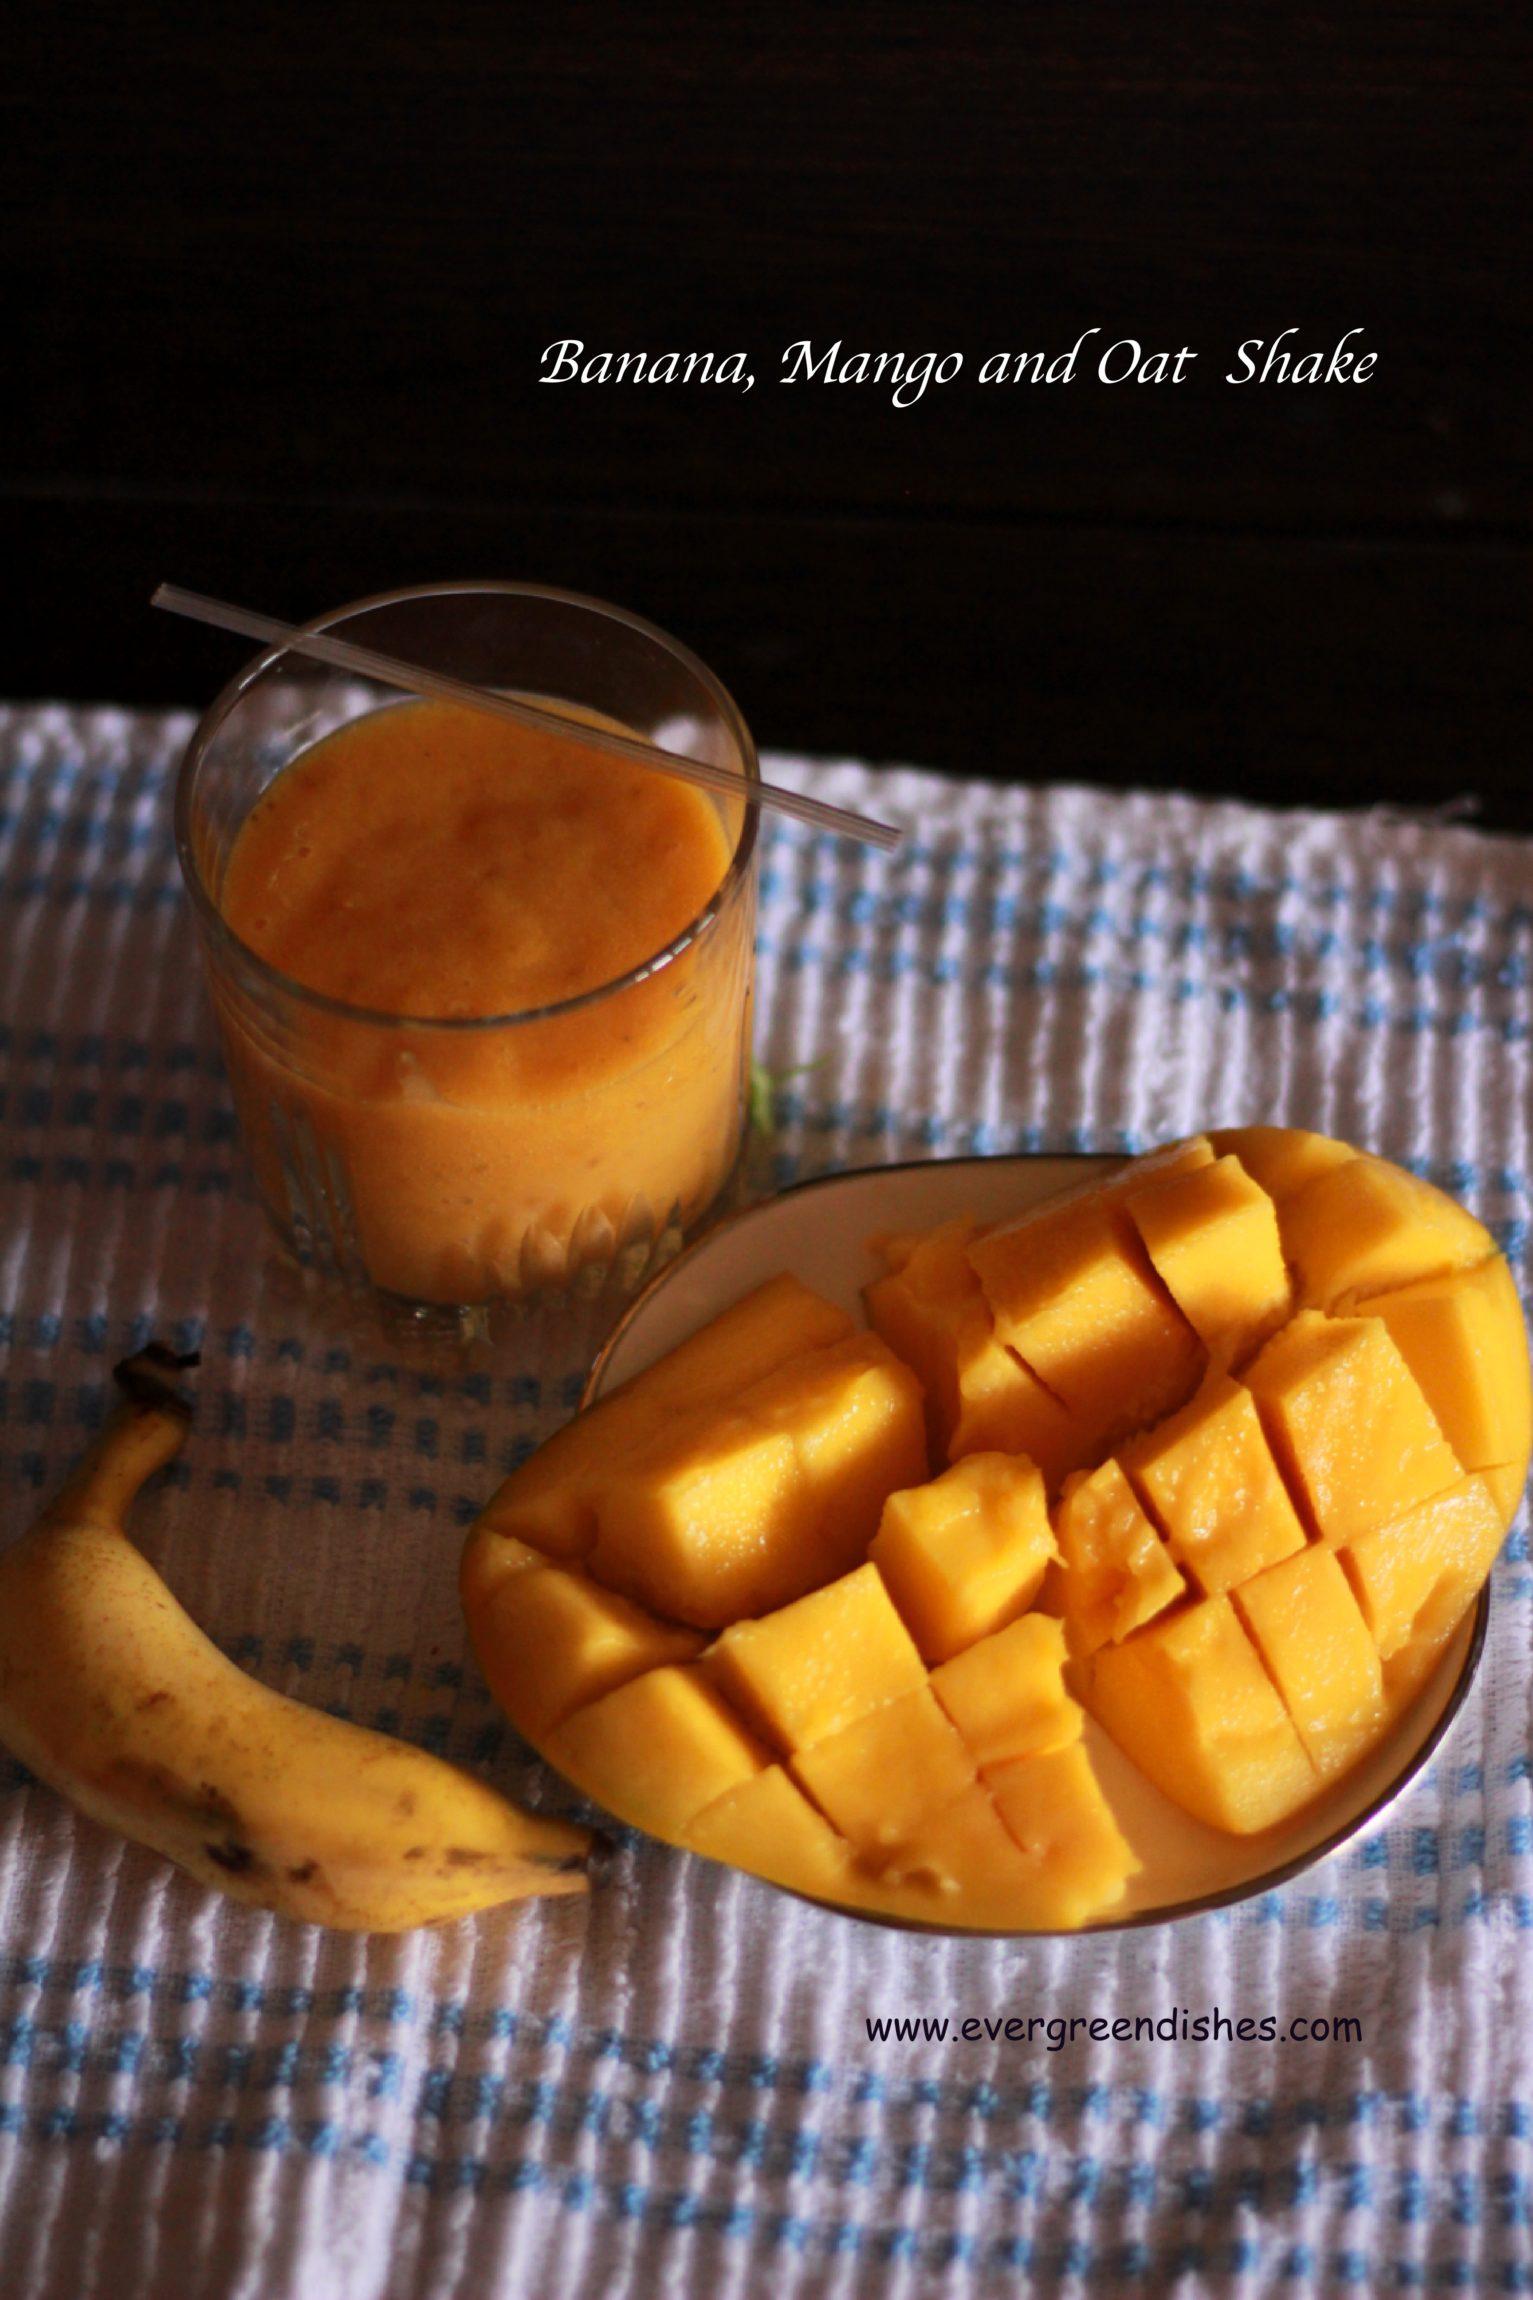 milkshake Banana  Mango Oat Shake banana mango shake 1533x2300